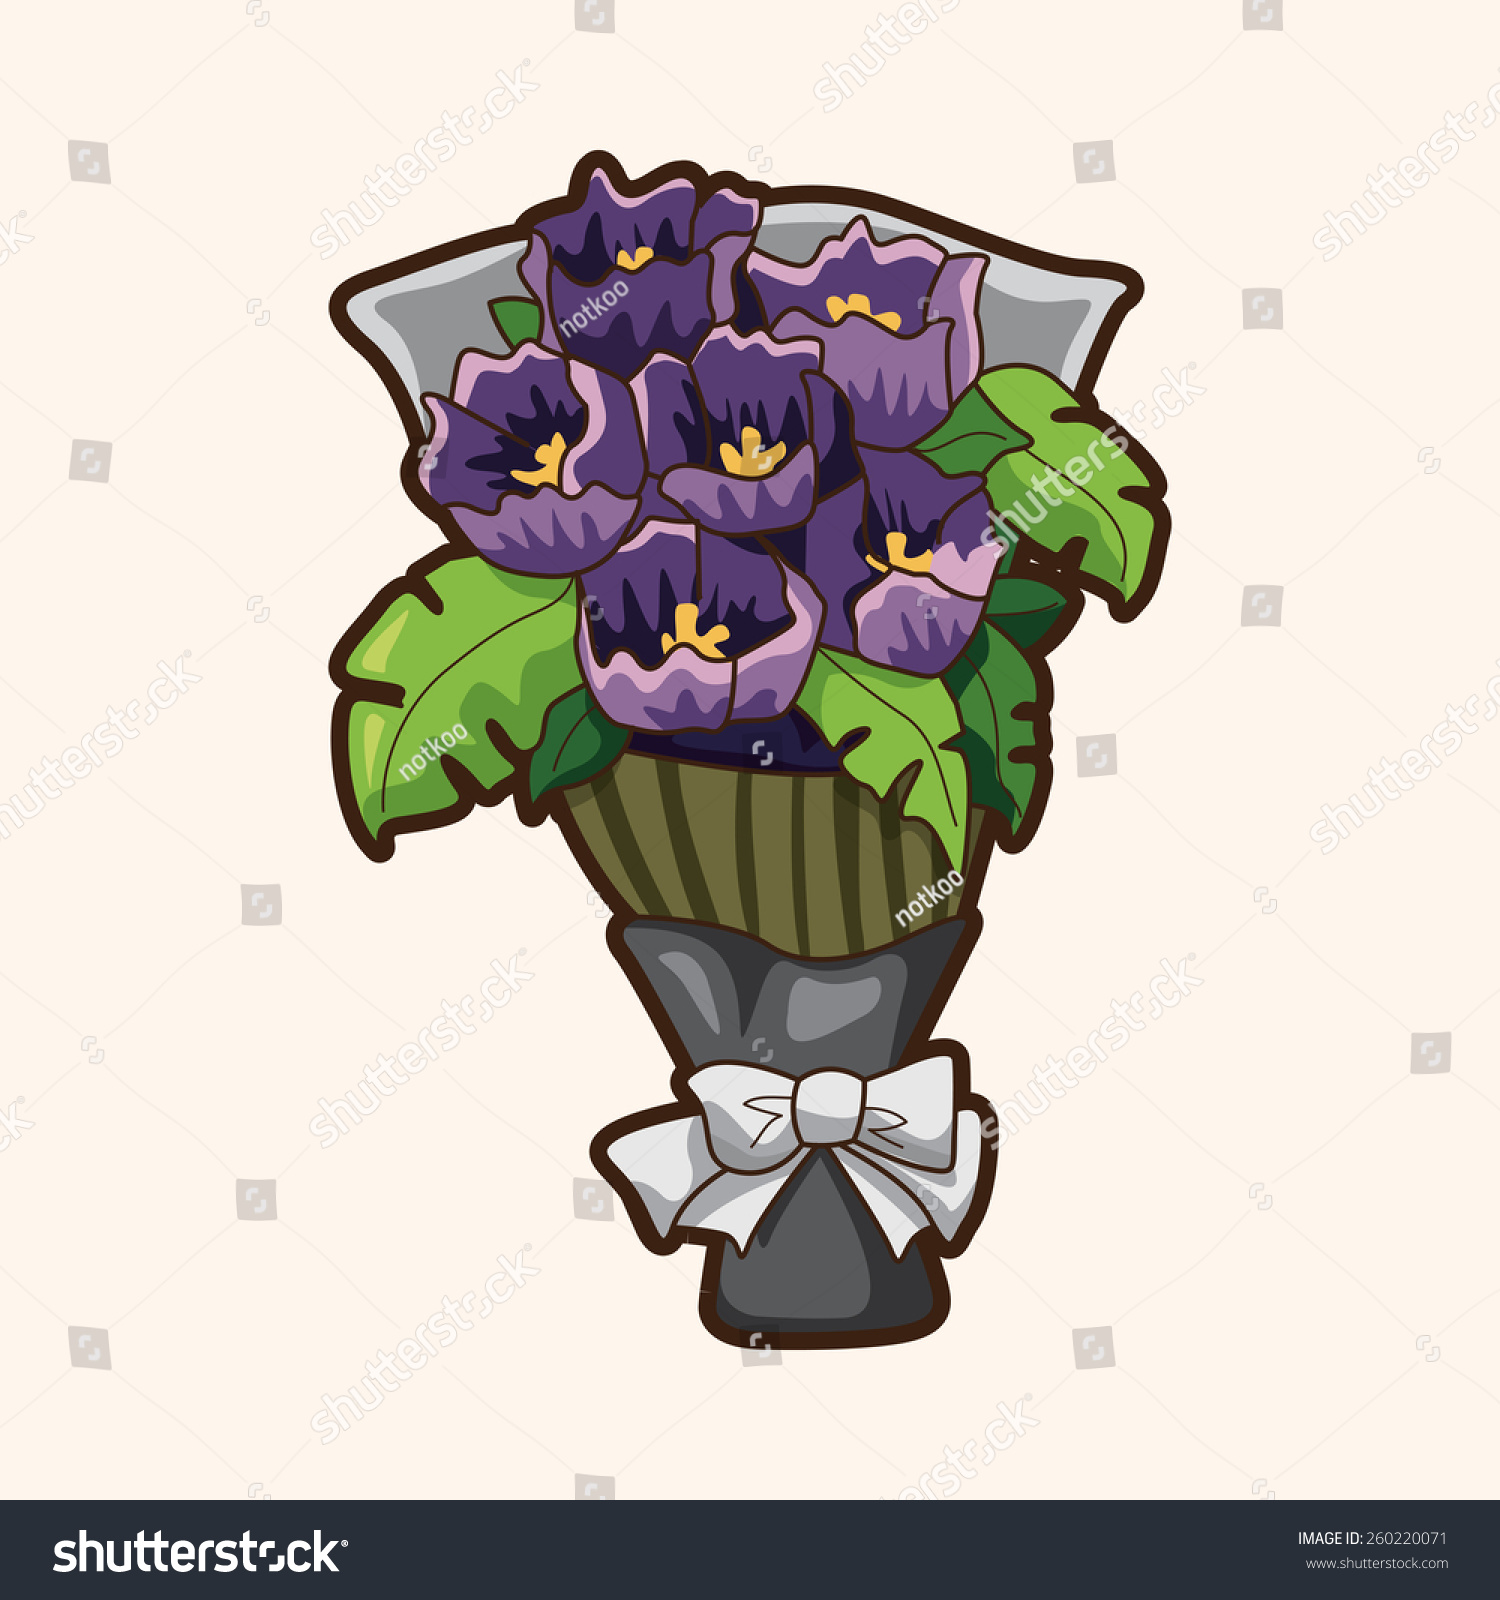 Cartoon Flower Bouquet Stock Illustration 260220071 - Shutterstock